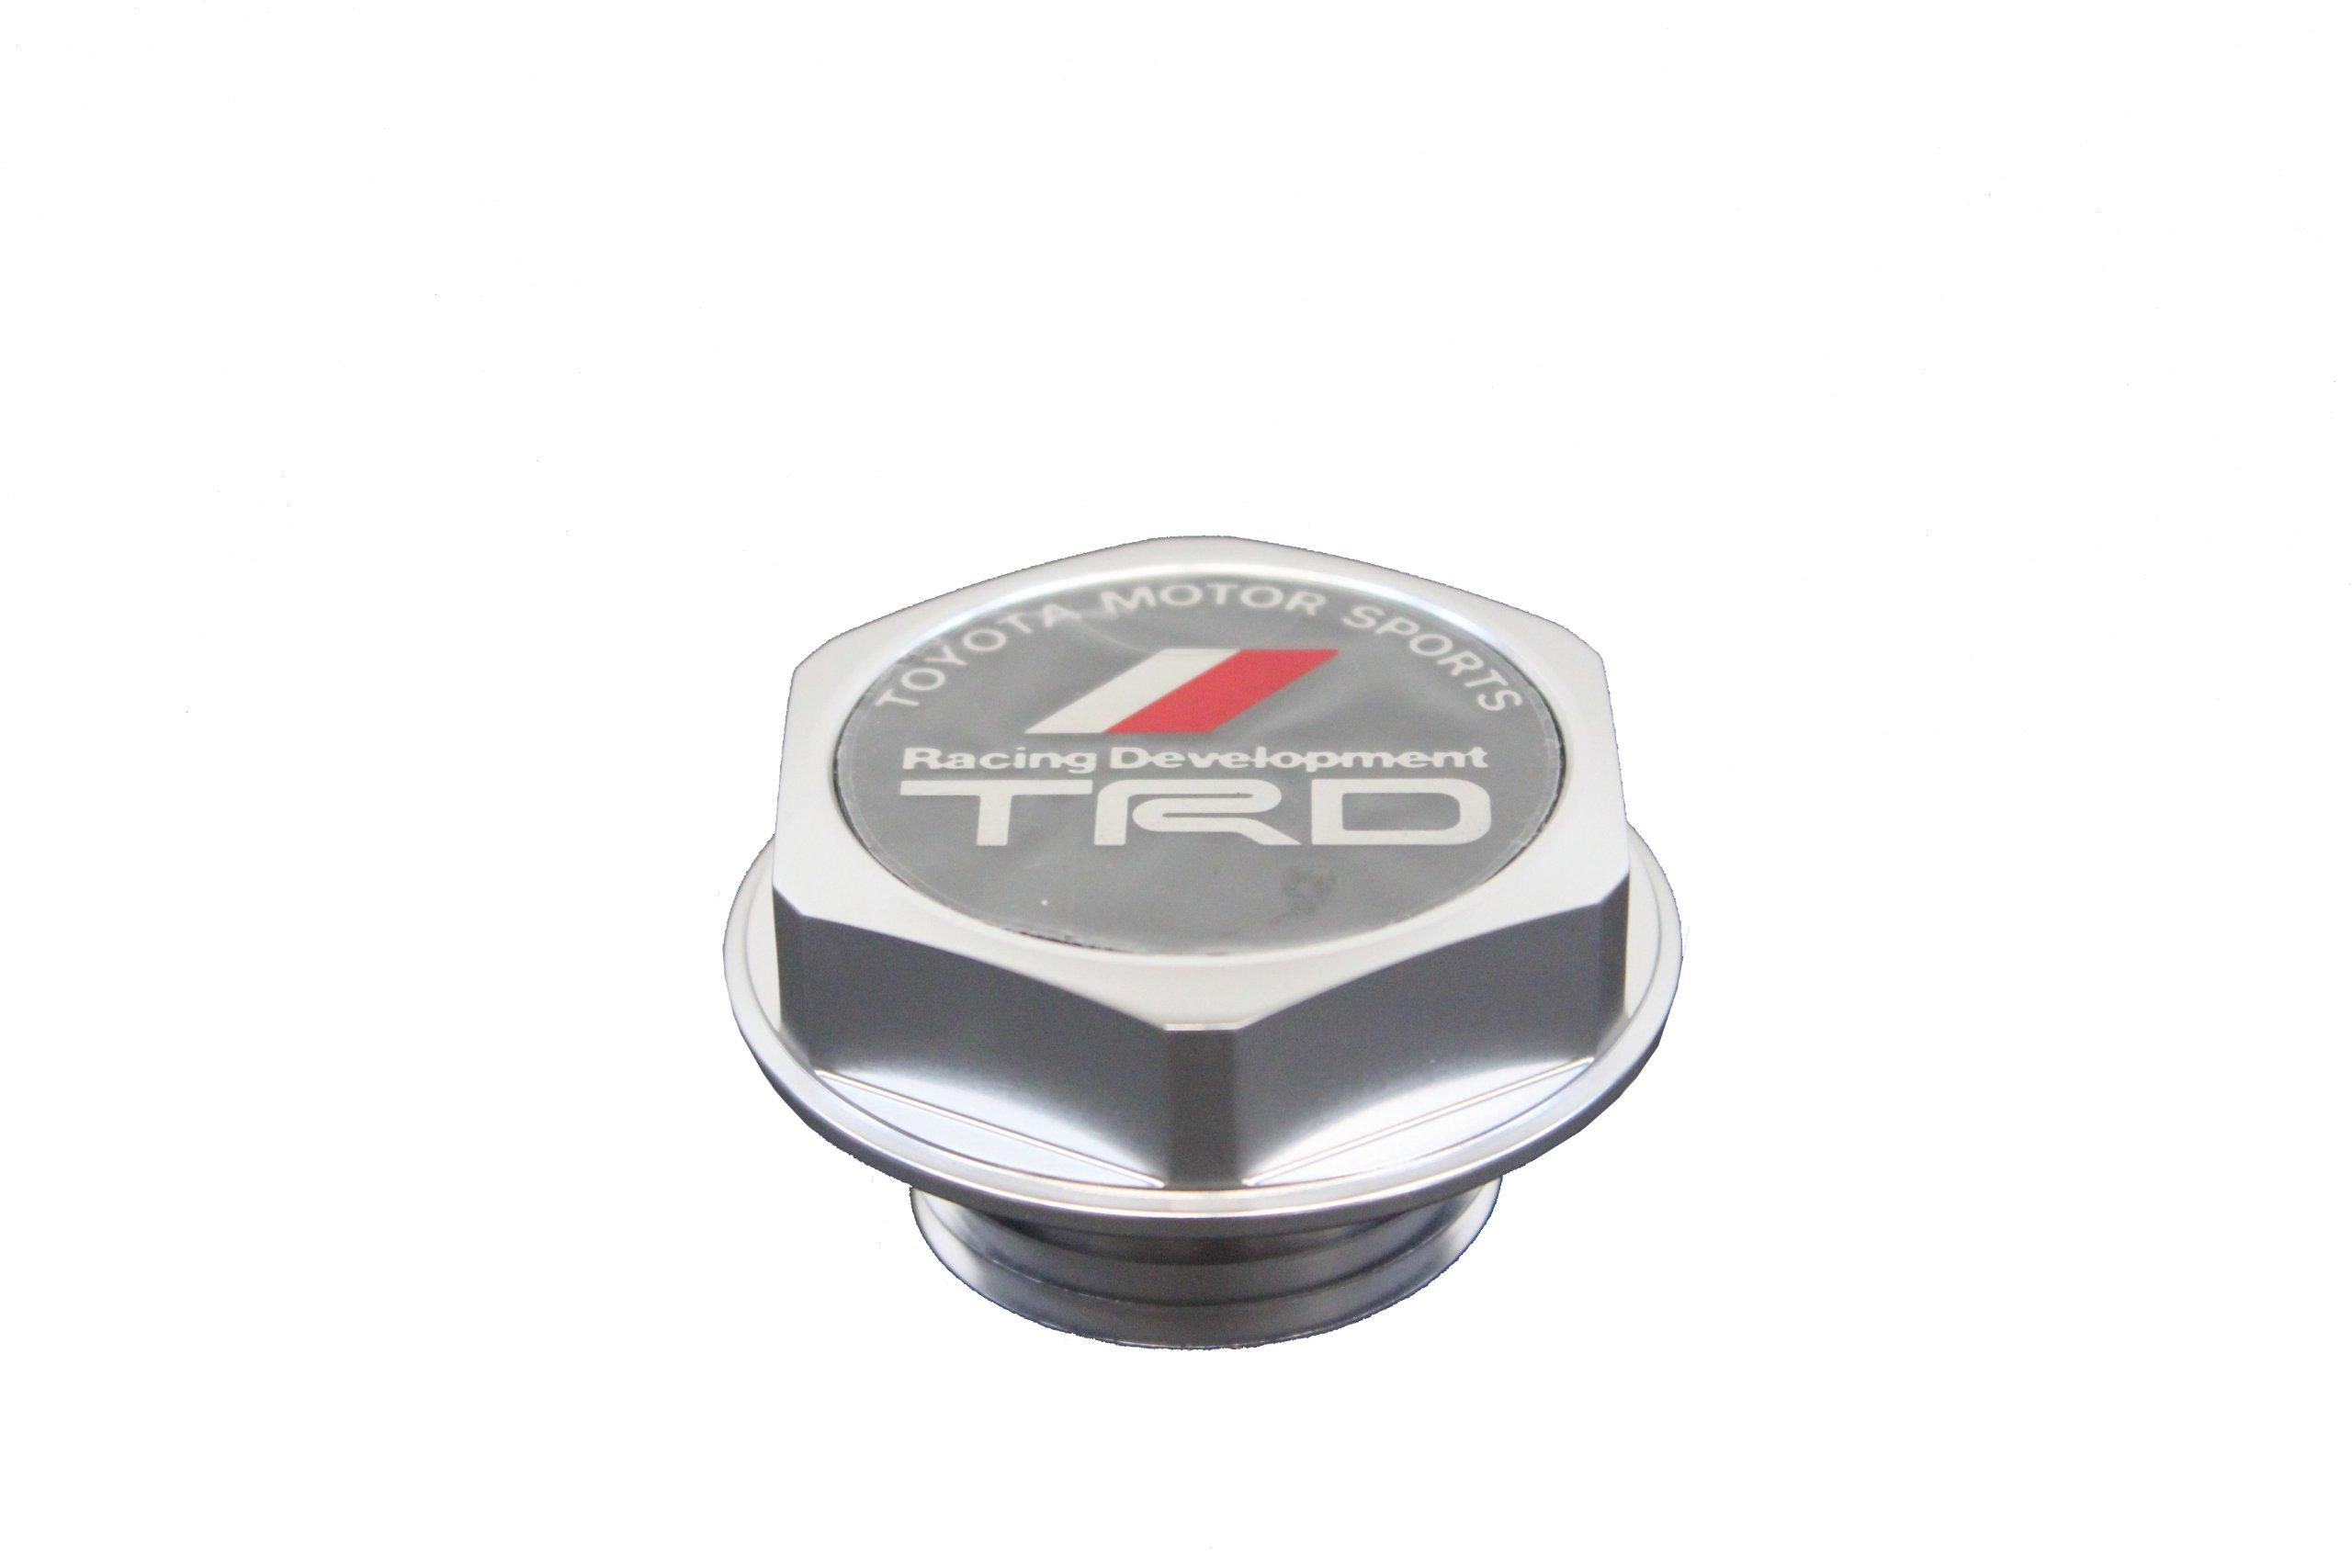 Genuine Toyota TRD Performance Oil Cap Polished Billet Aluminium PTR35-00110